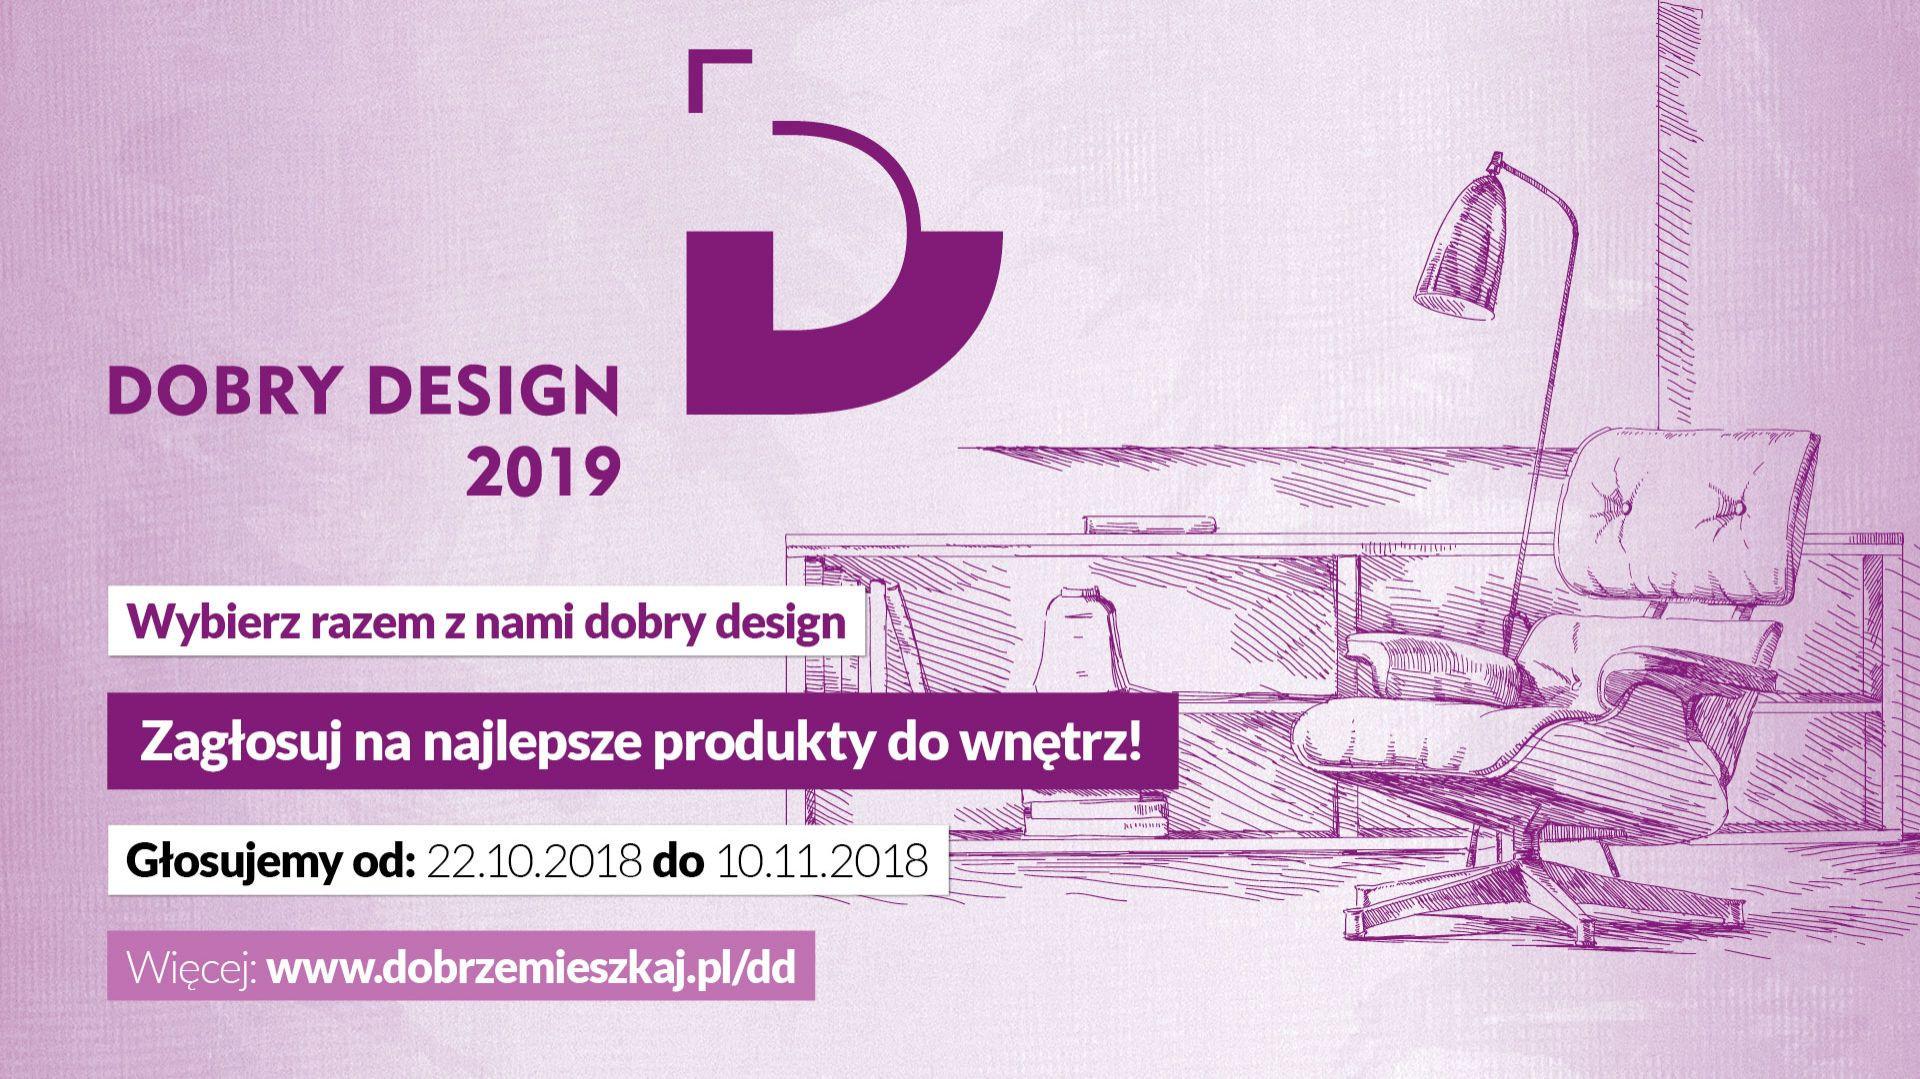 Dobry Design 2019